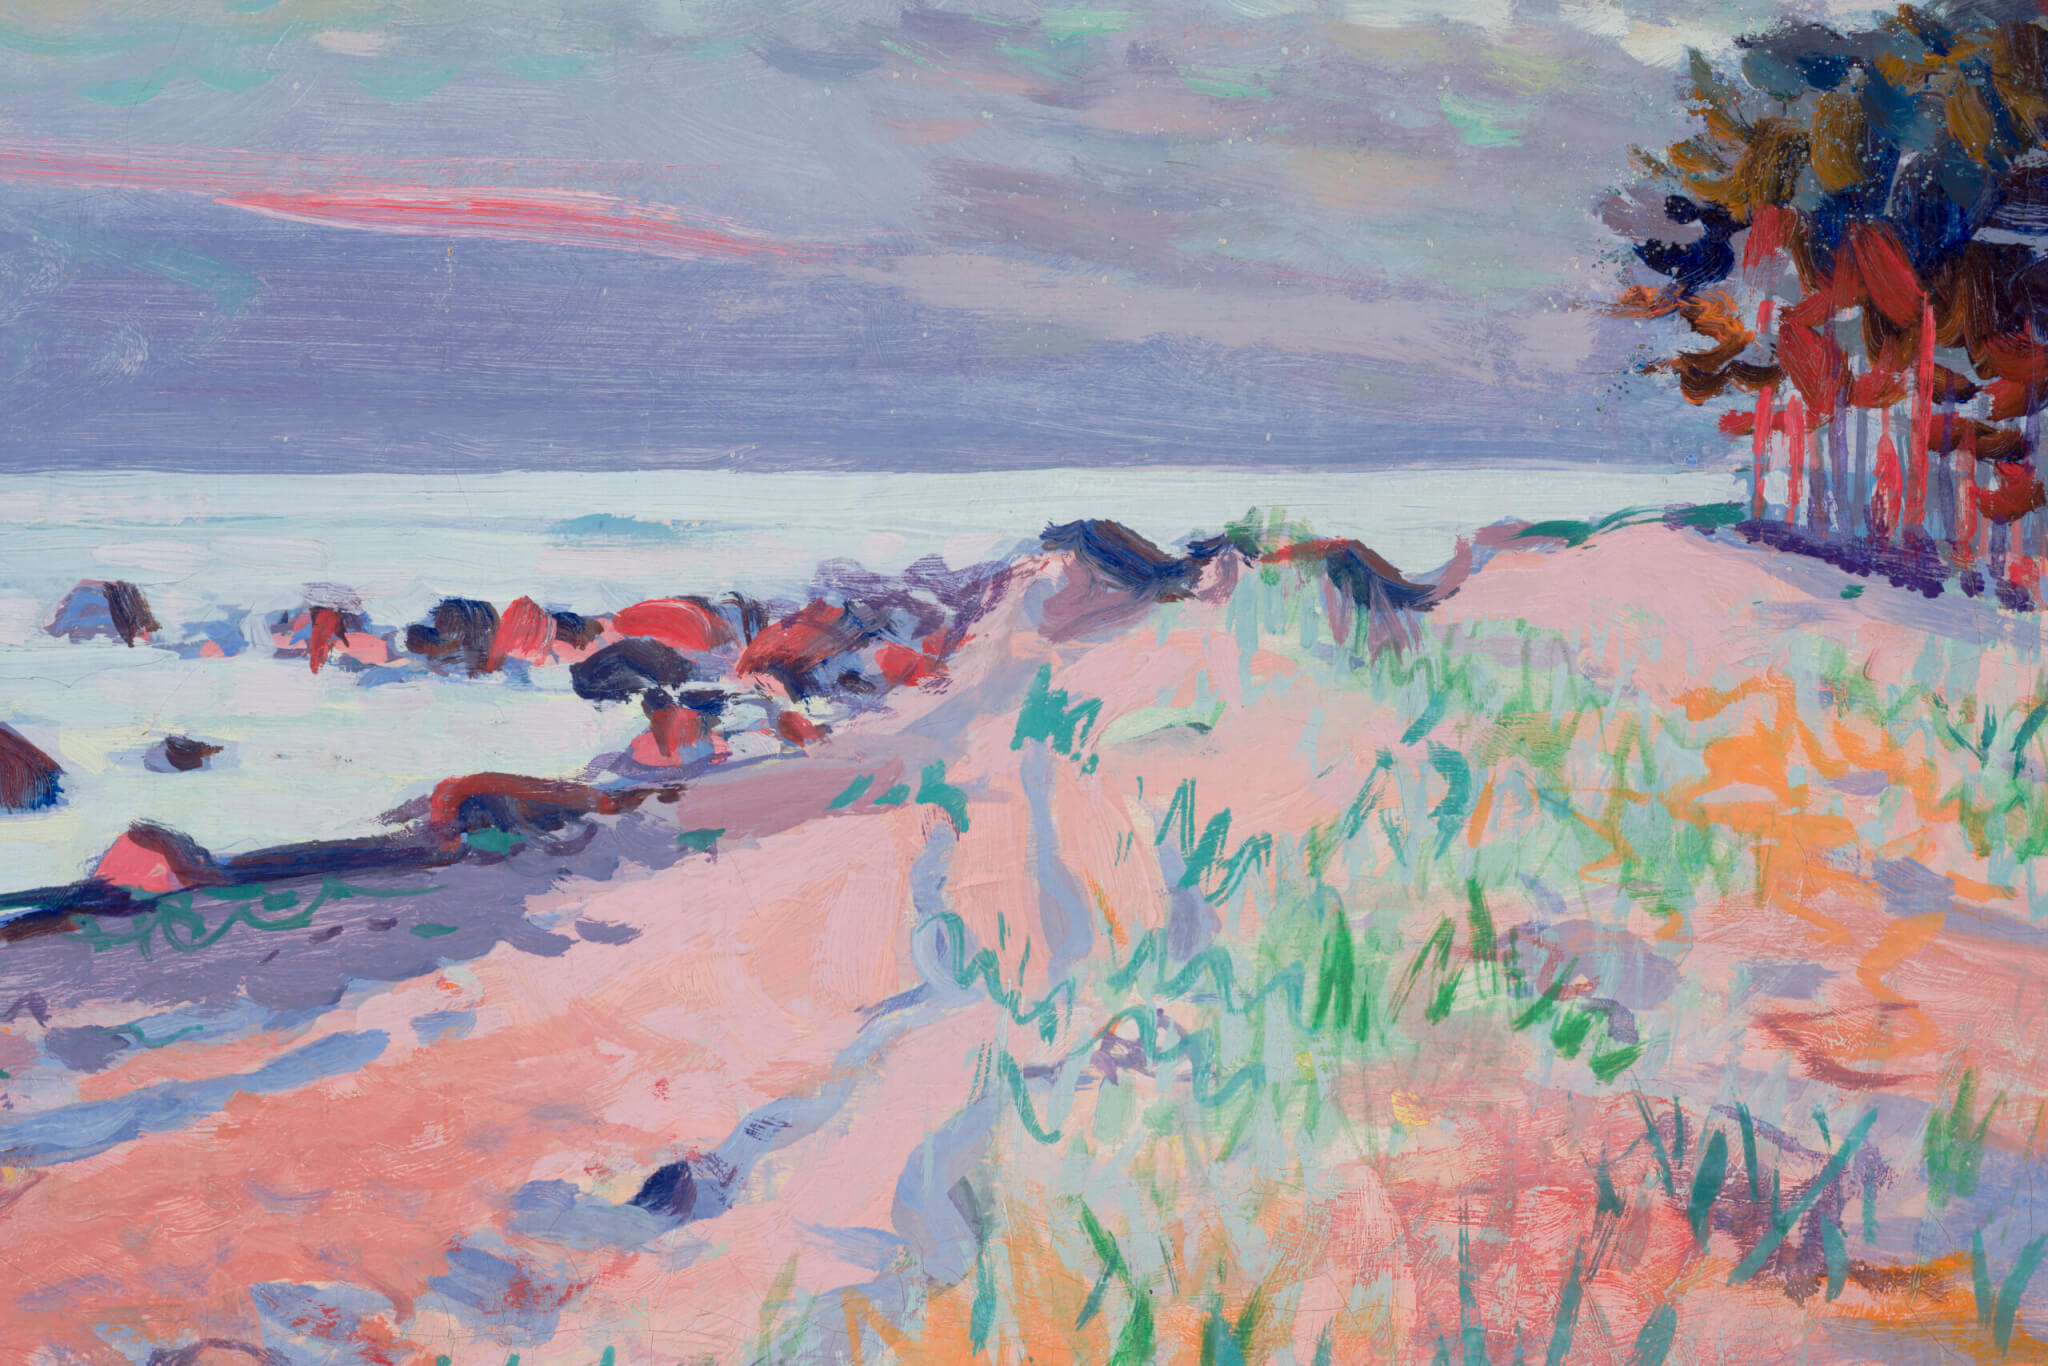 Richard-Uutmaa-Õhtuvalgus-rannal